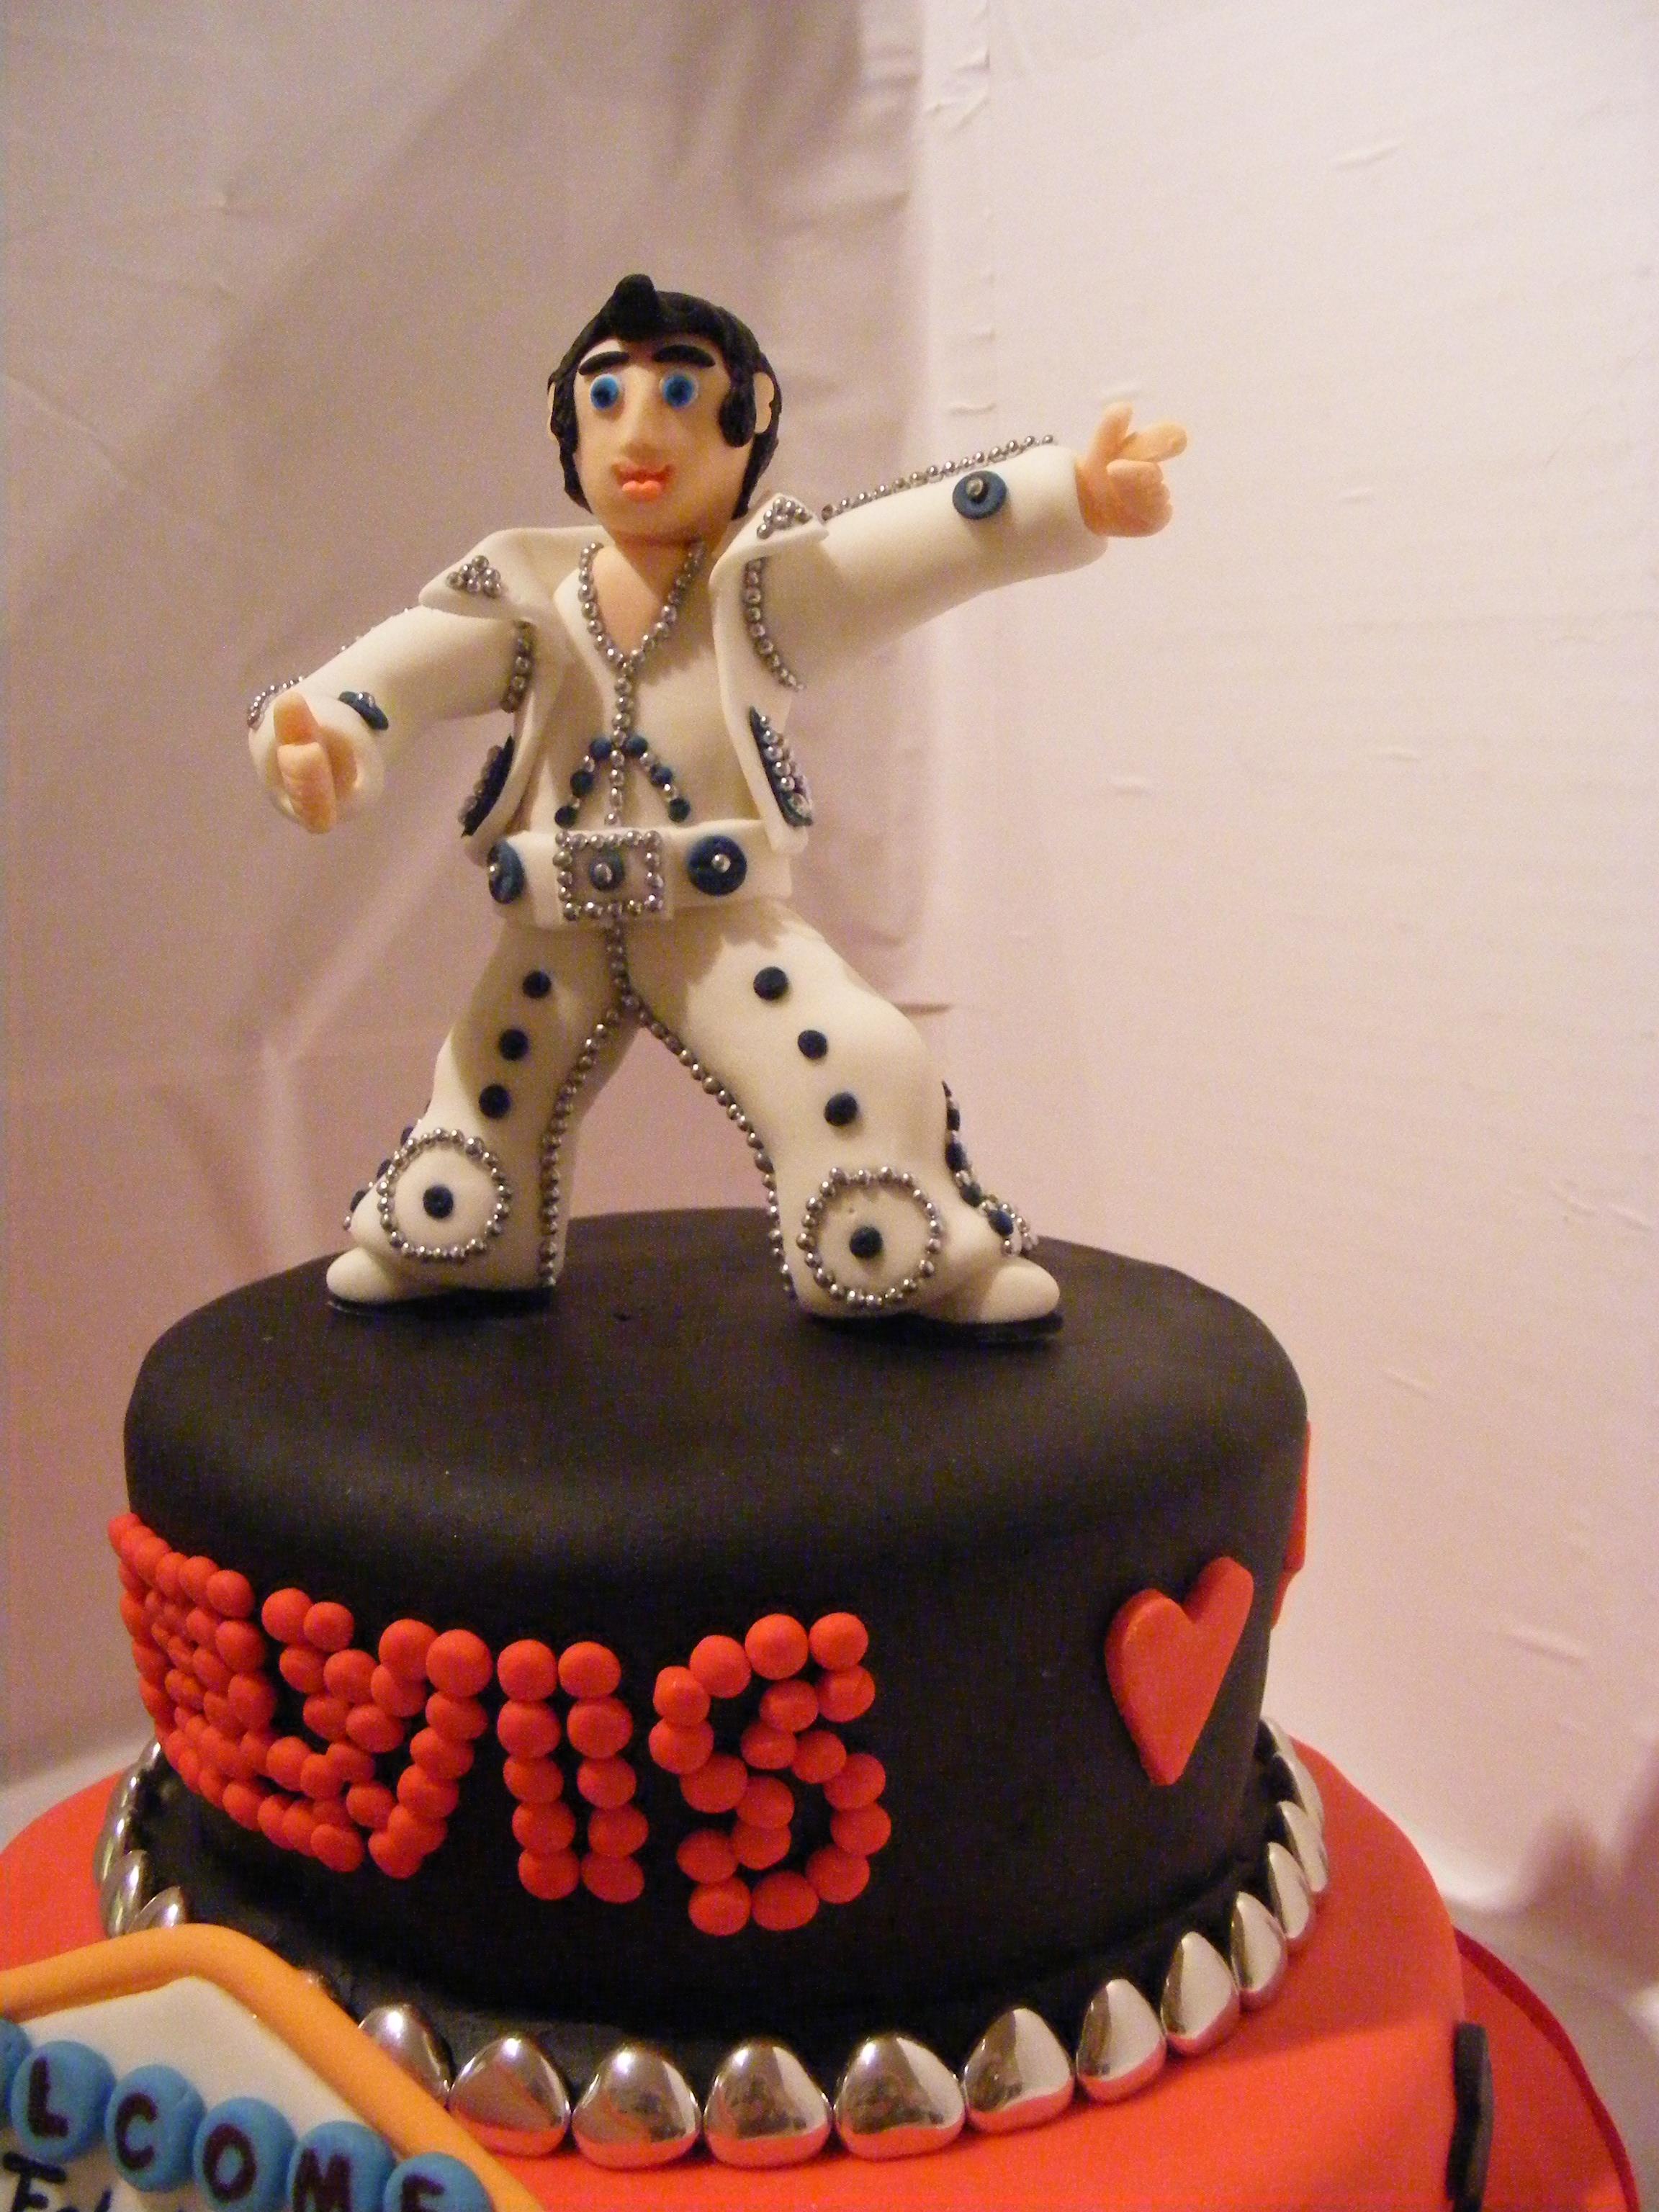 Elvis Presley Cake Toppers